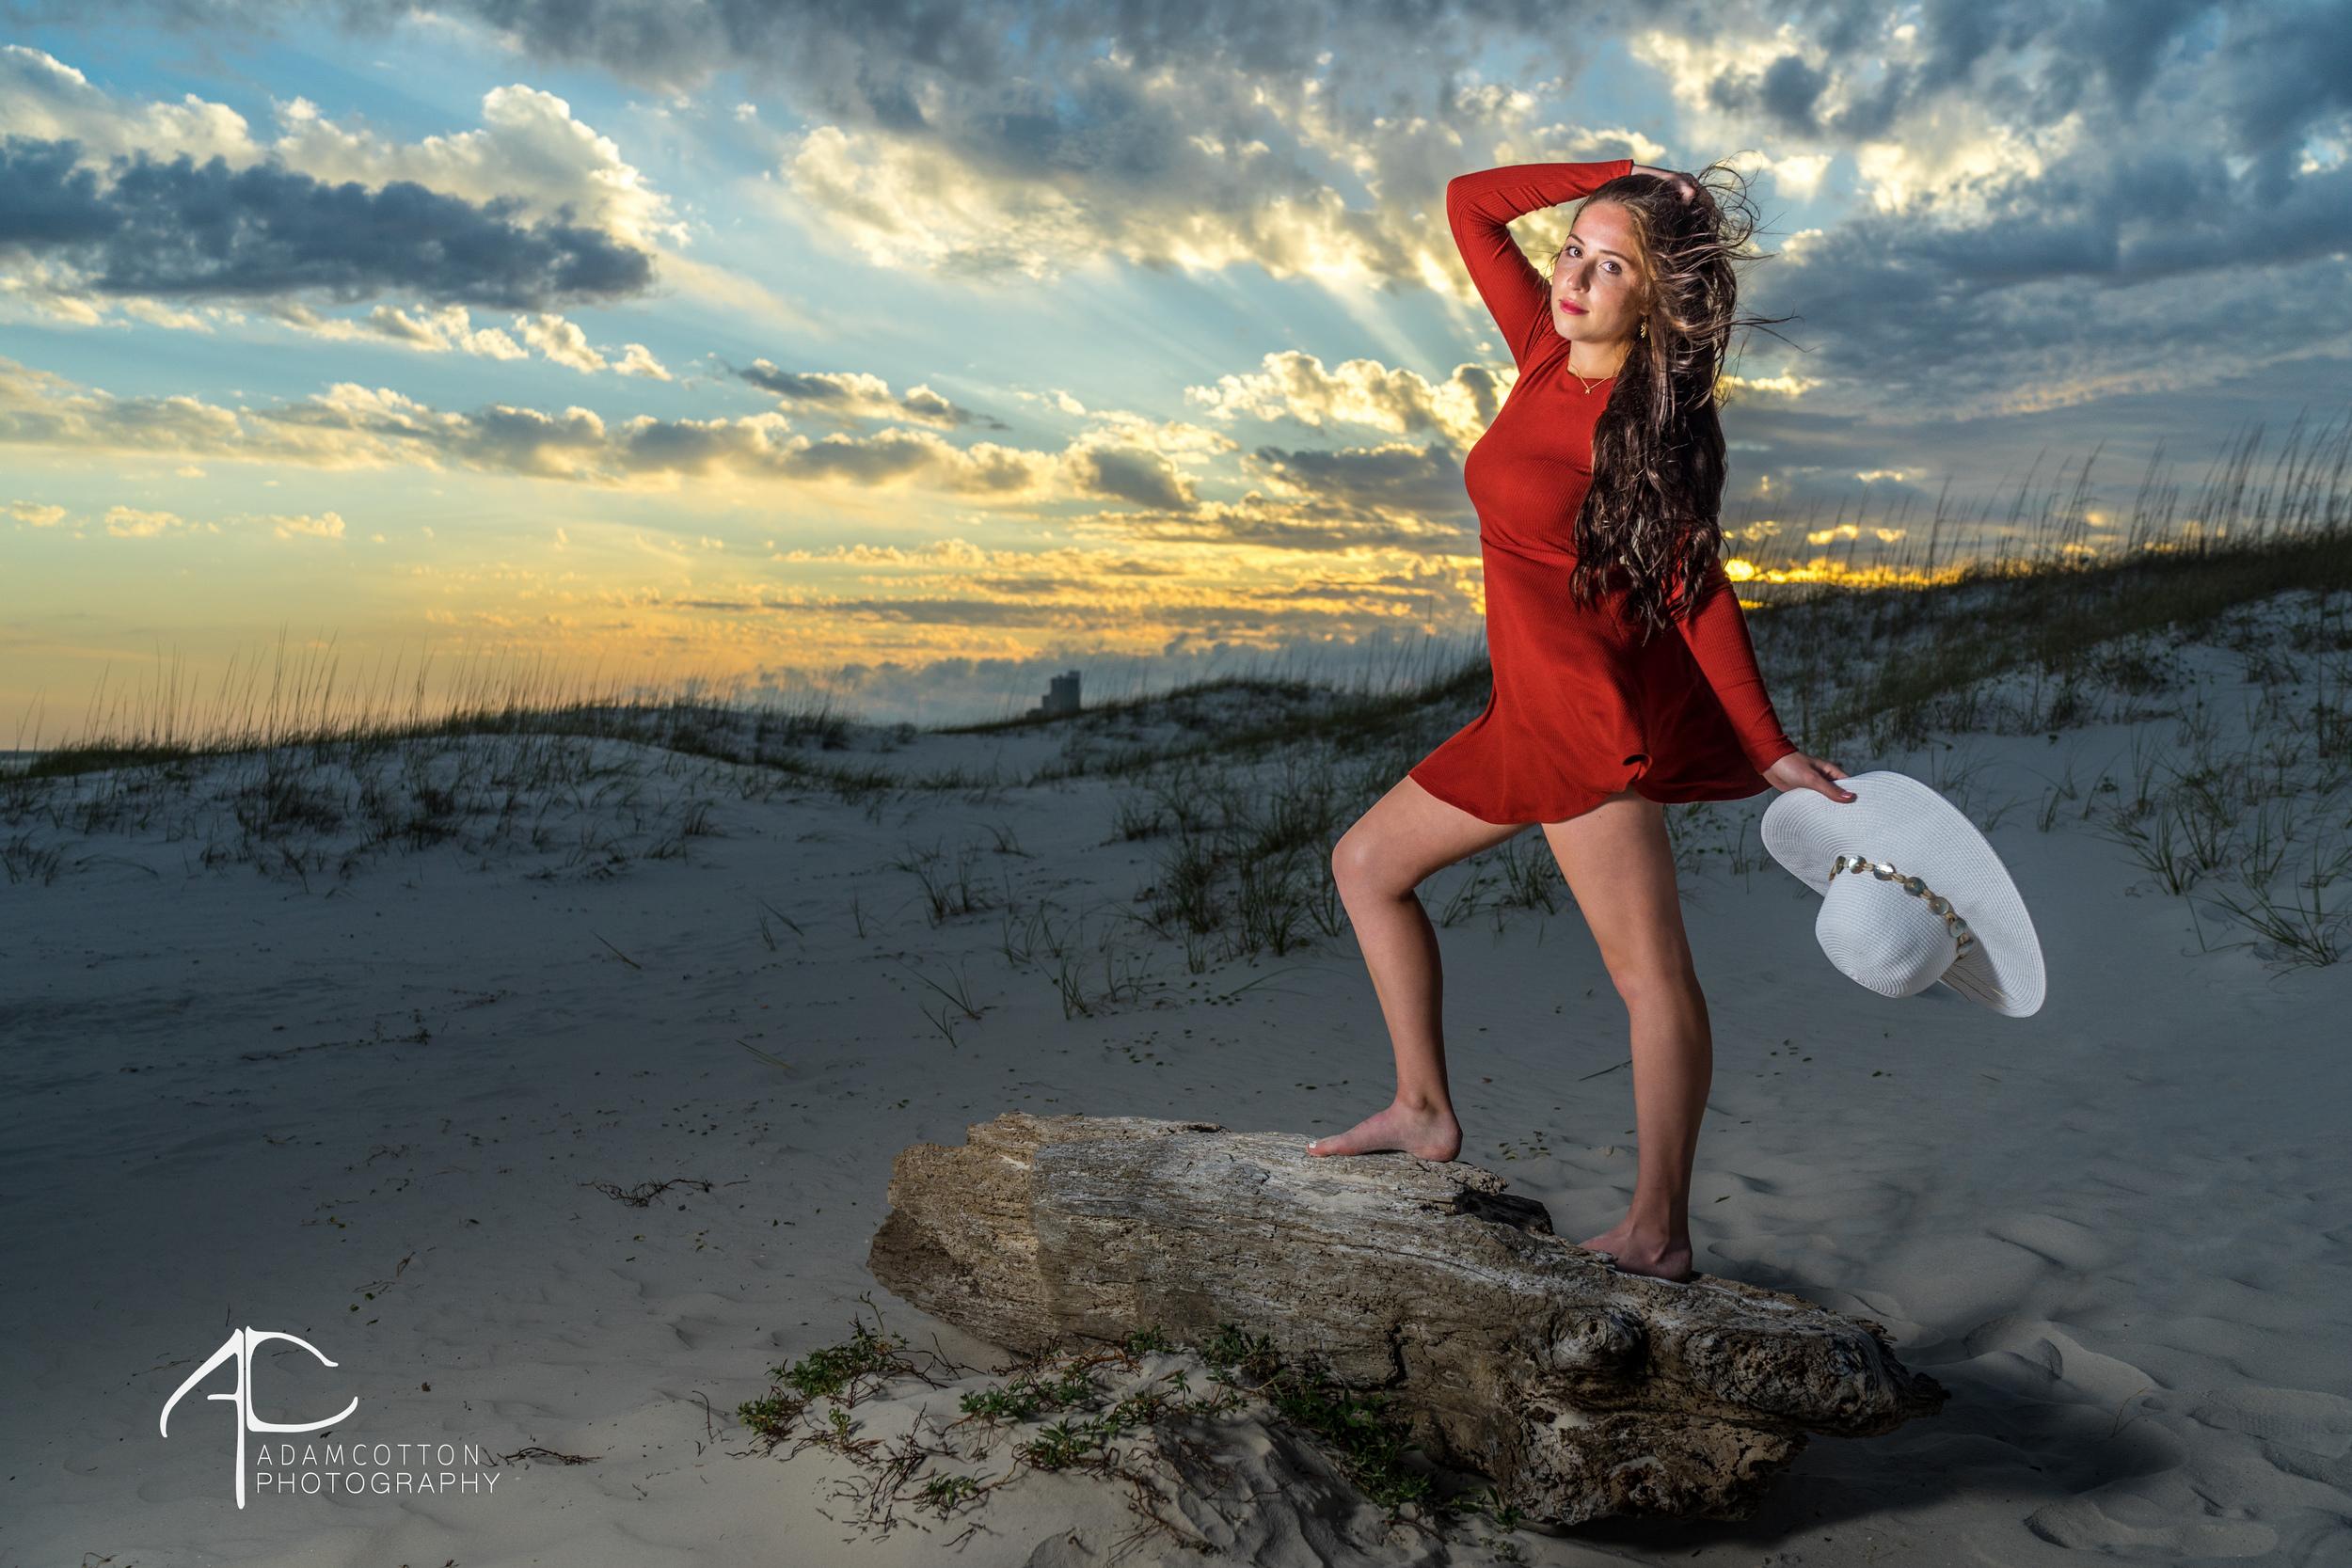 portrait photoshoot with model holding sun hat at sunset at orange beach alabama